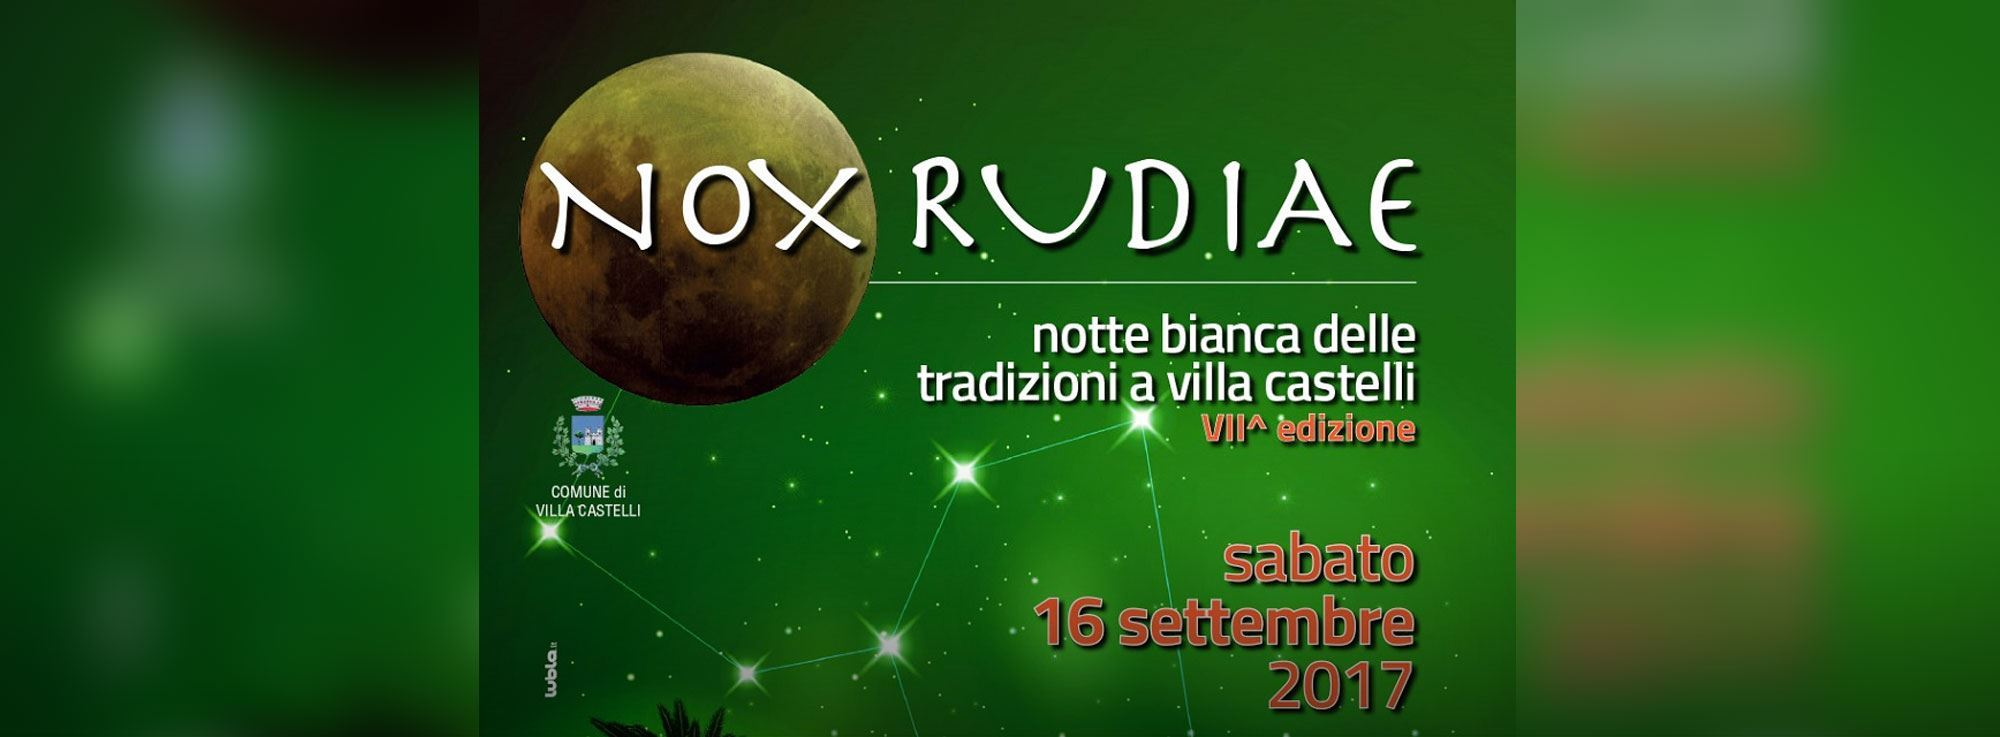 Villa Castelli: Nox Rudiae